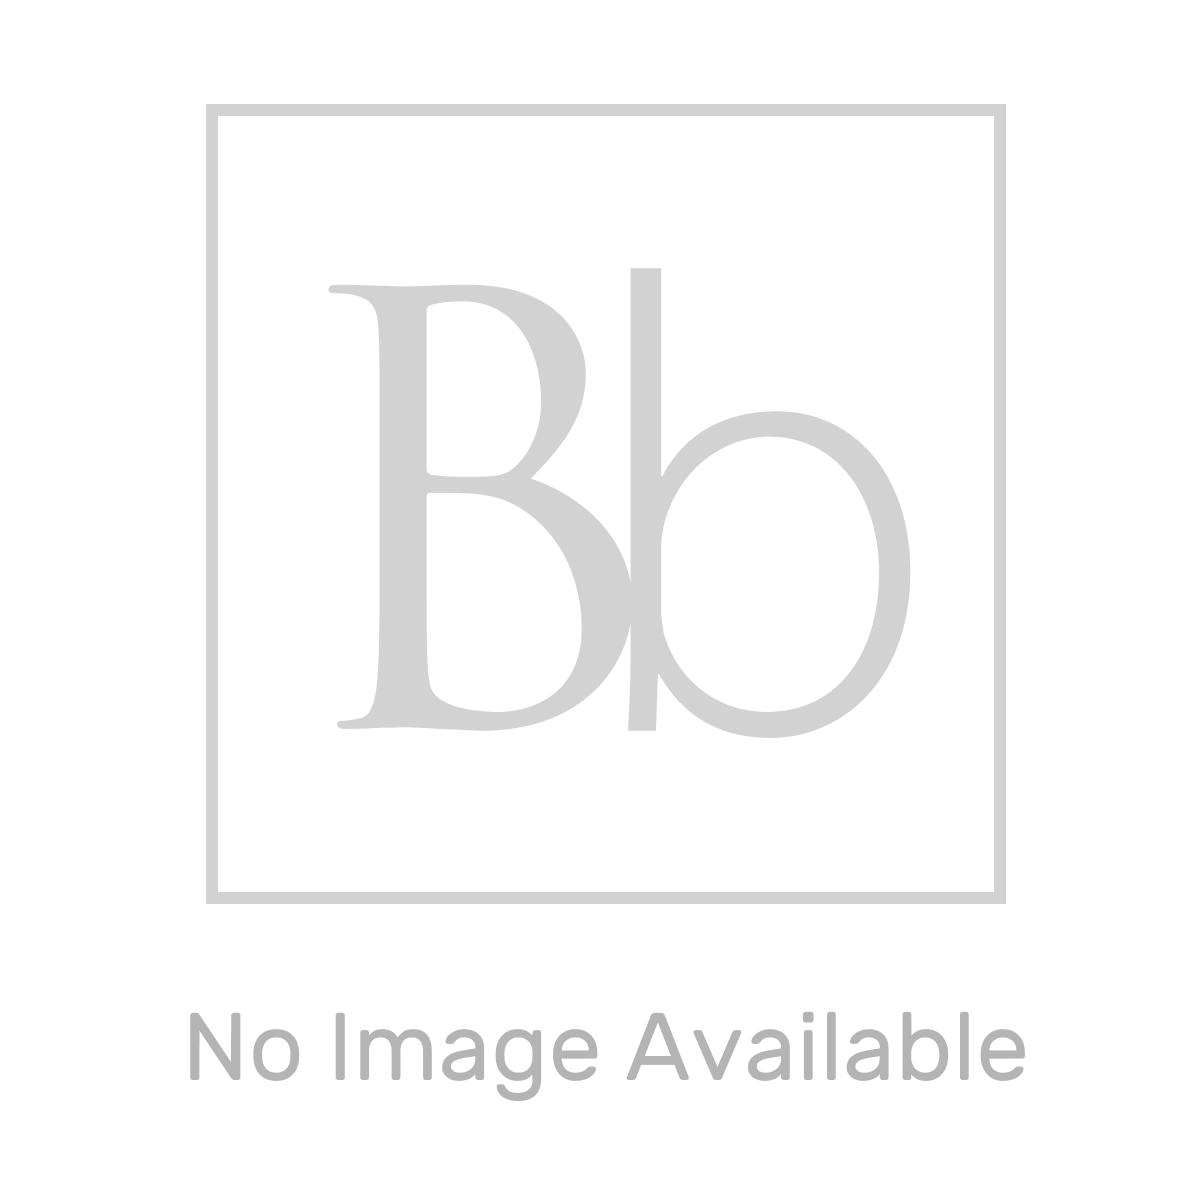 Premier High Gloss White Storage Cupboard - Cupboard